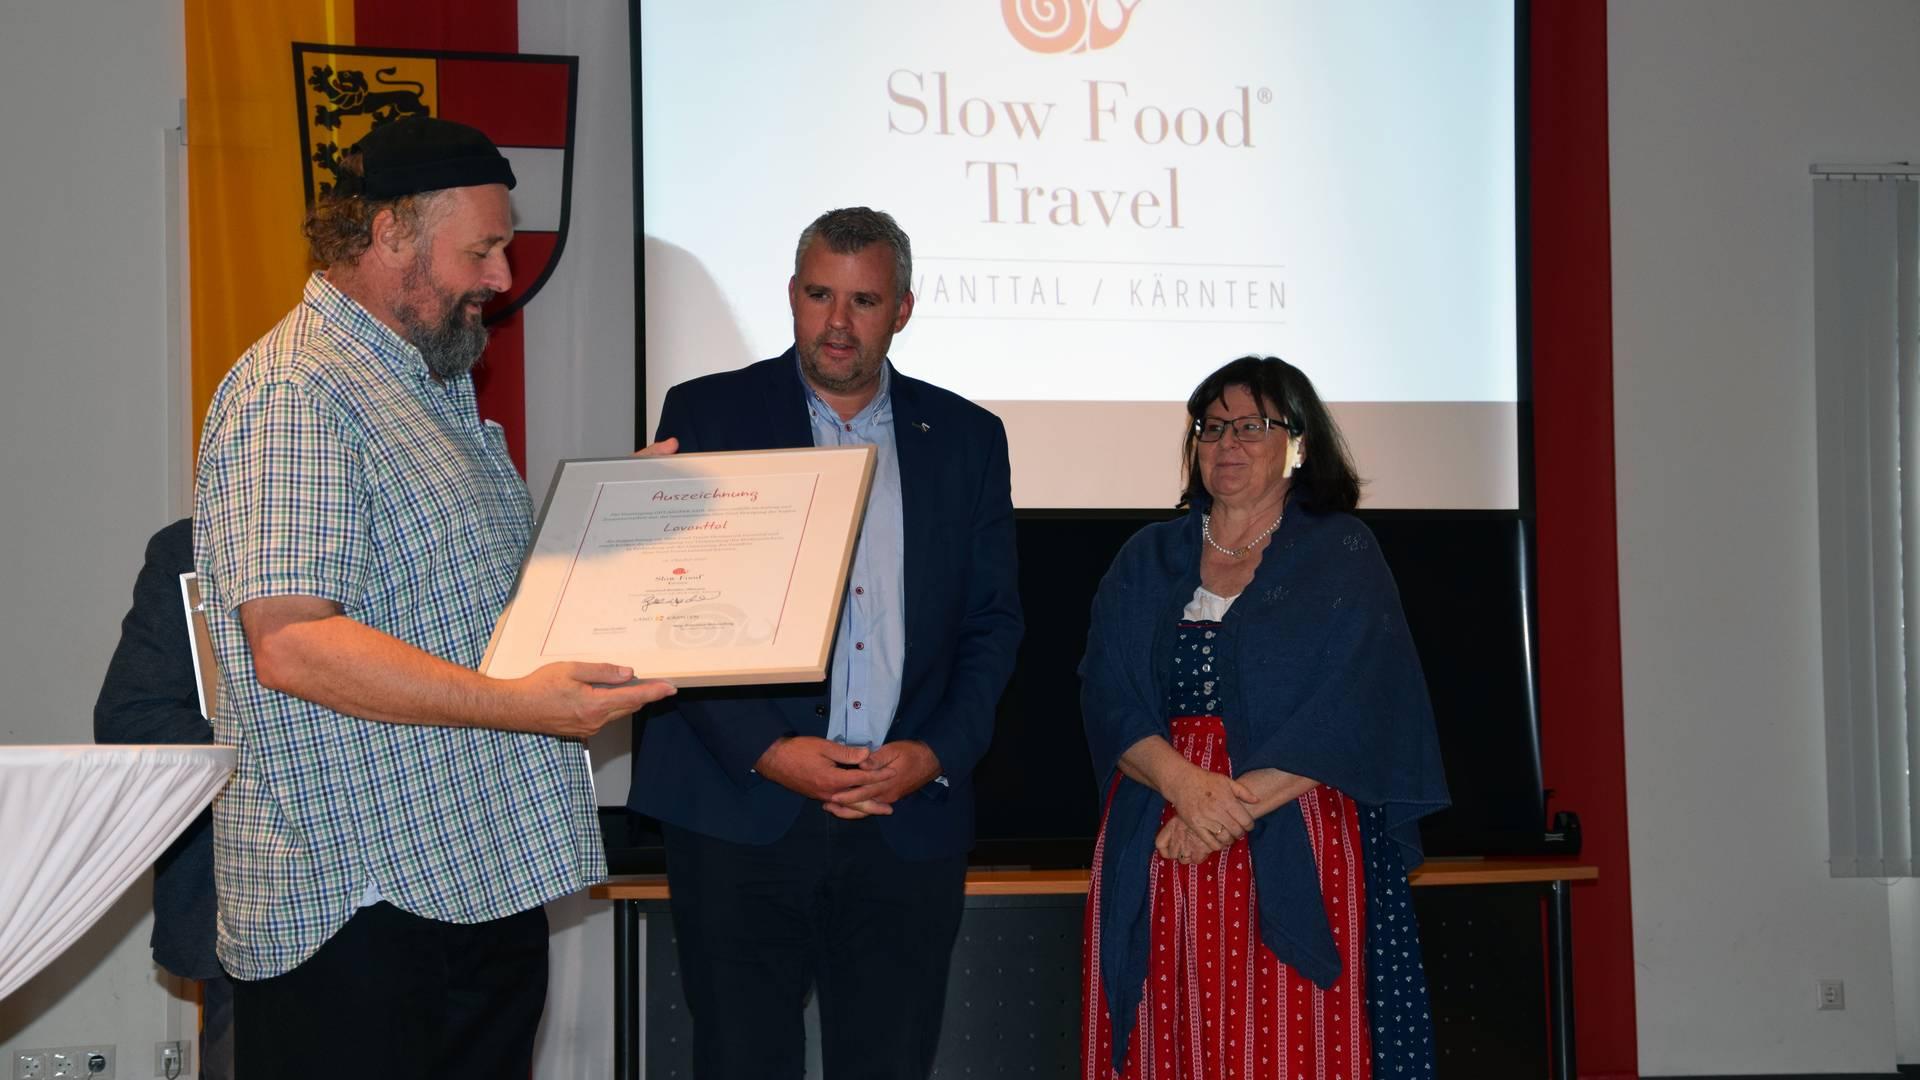 Slow Food Travel Lavanttal